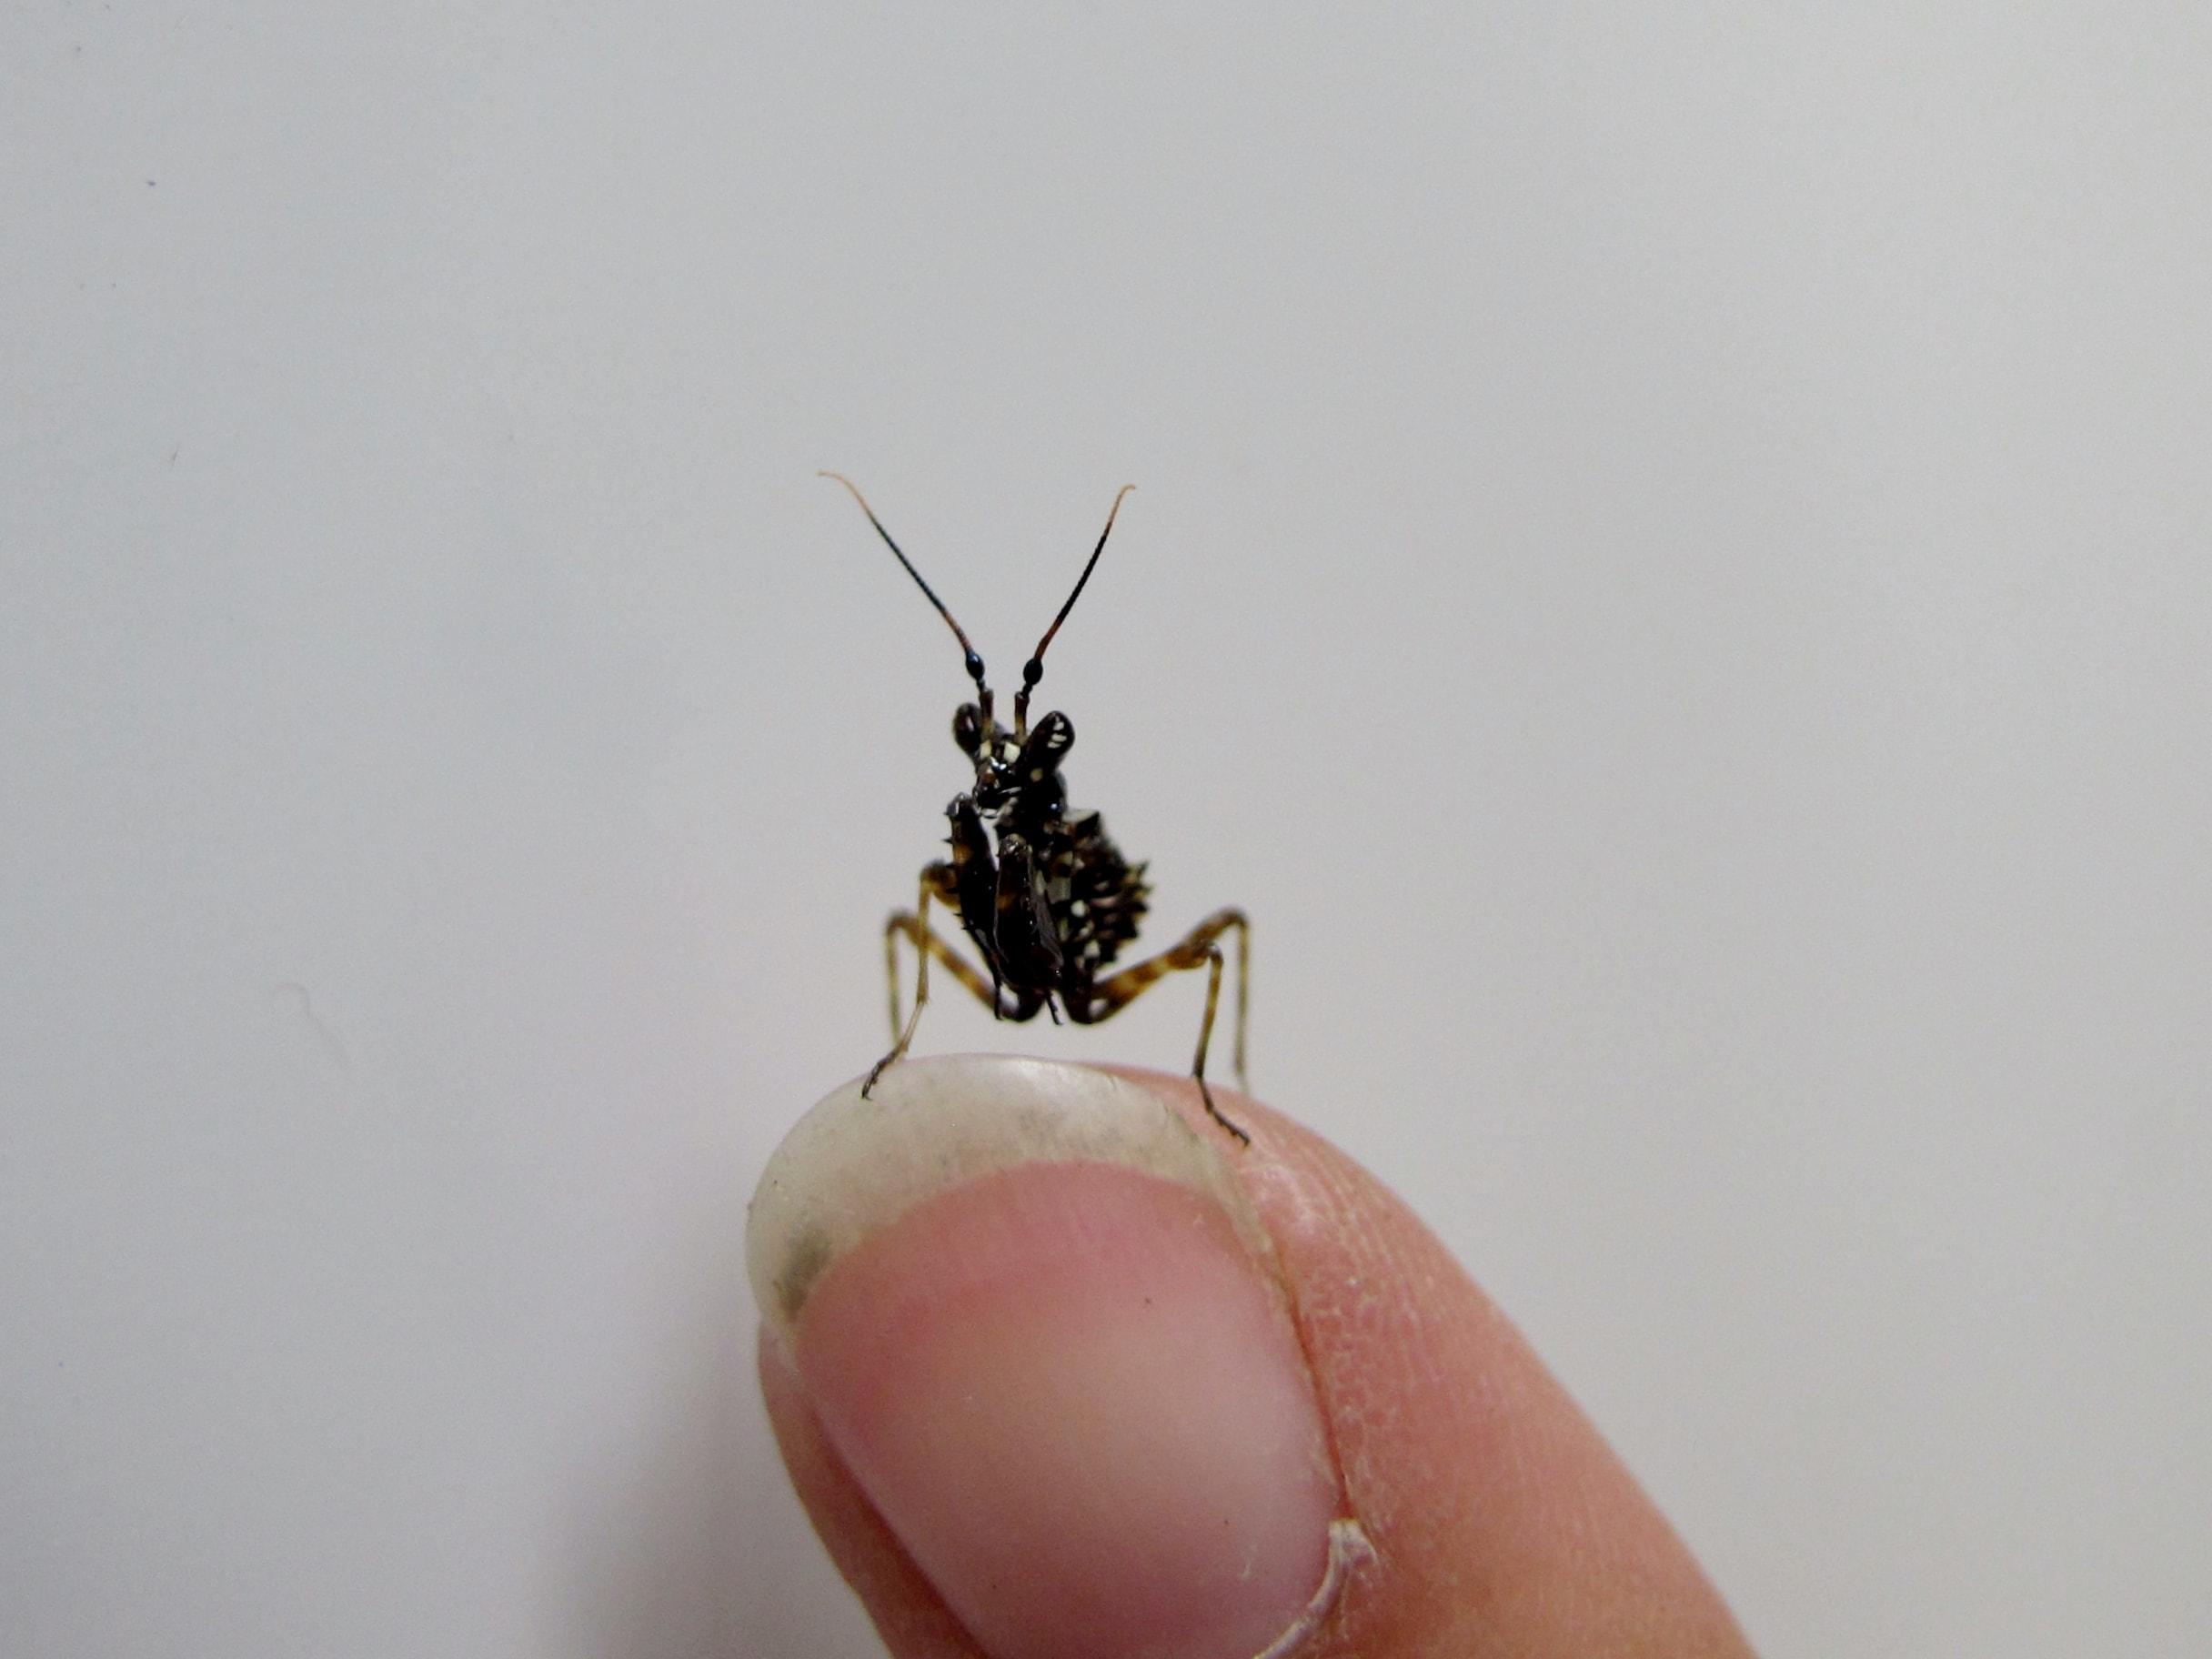 Spiny Flower Mantis (Pseudocreobotra wahlbergi)